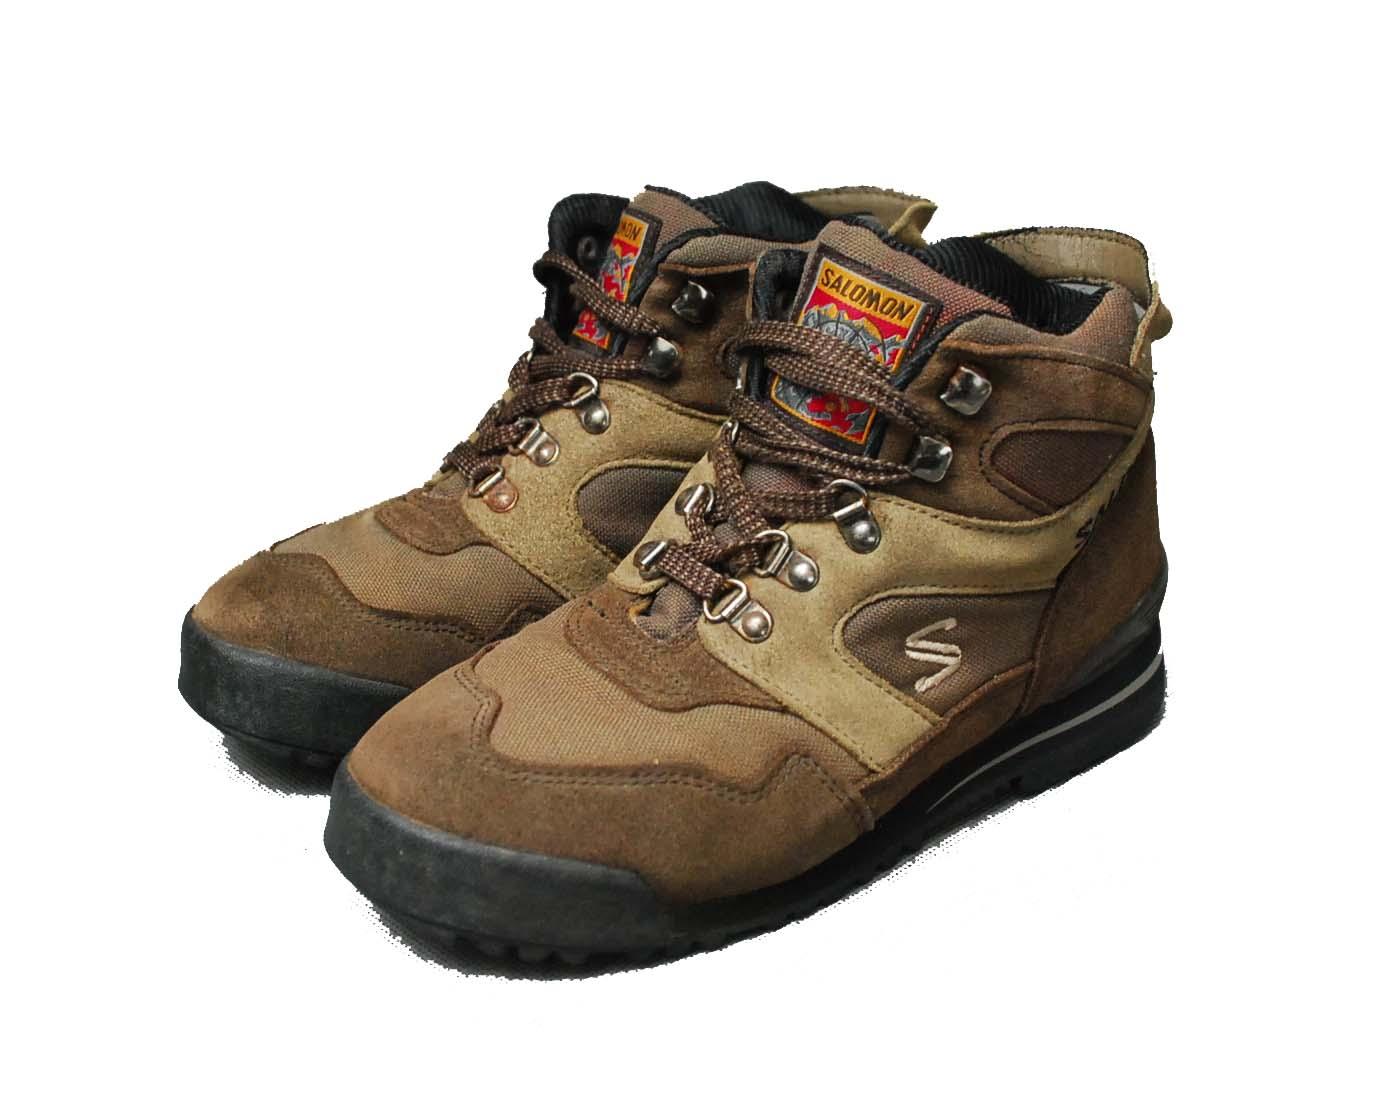 SALOMON buty trekkingowe turystyczne vintage r 38